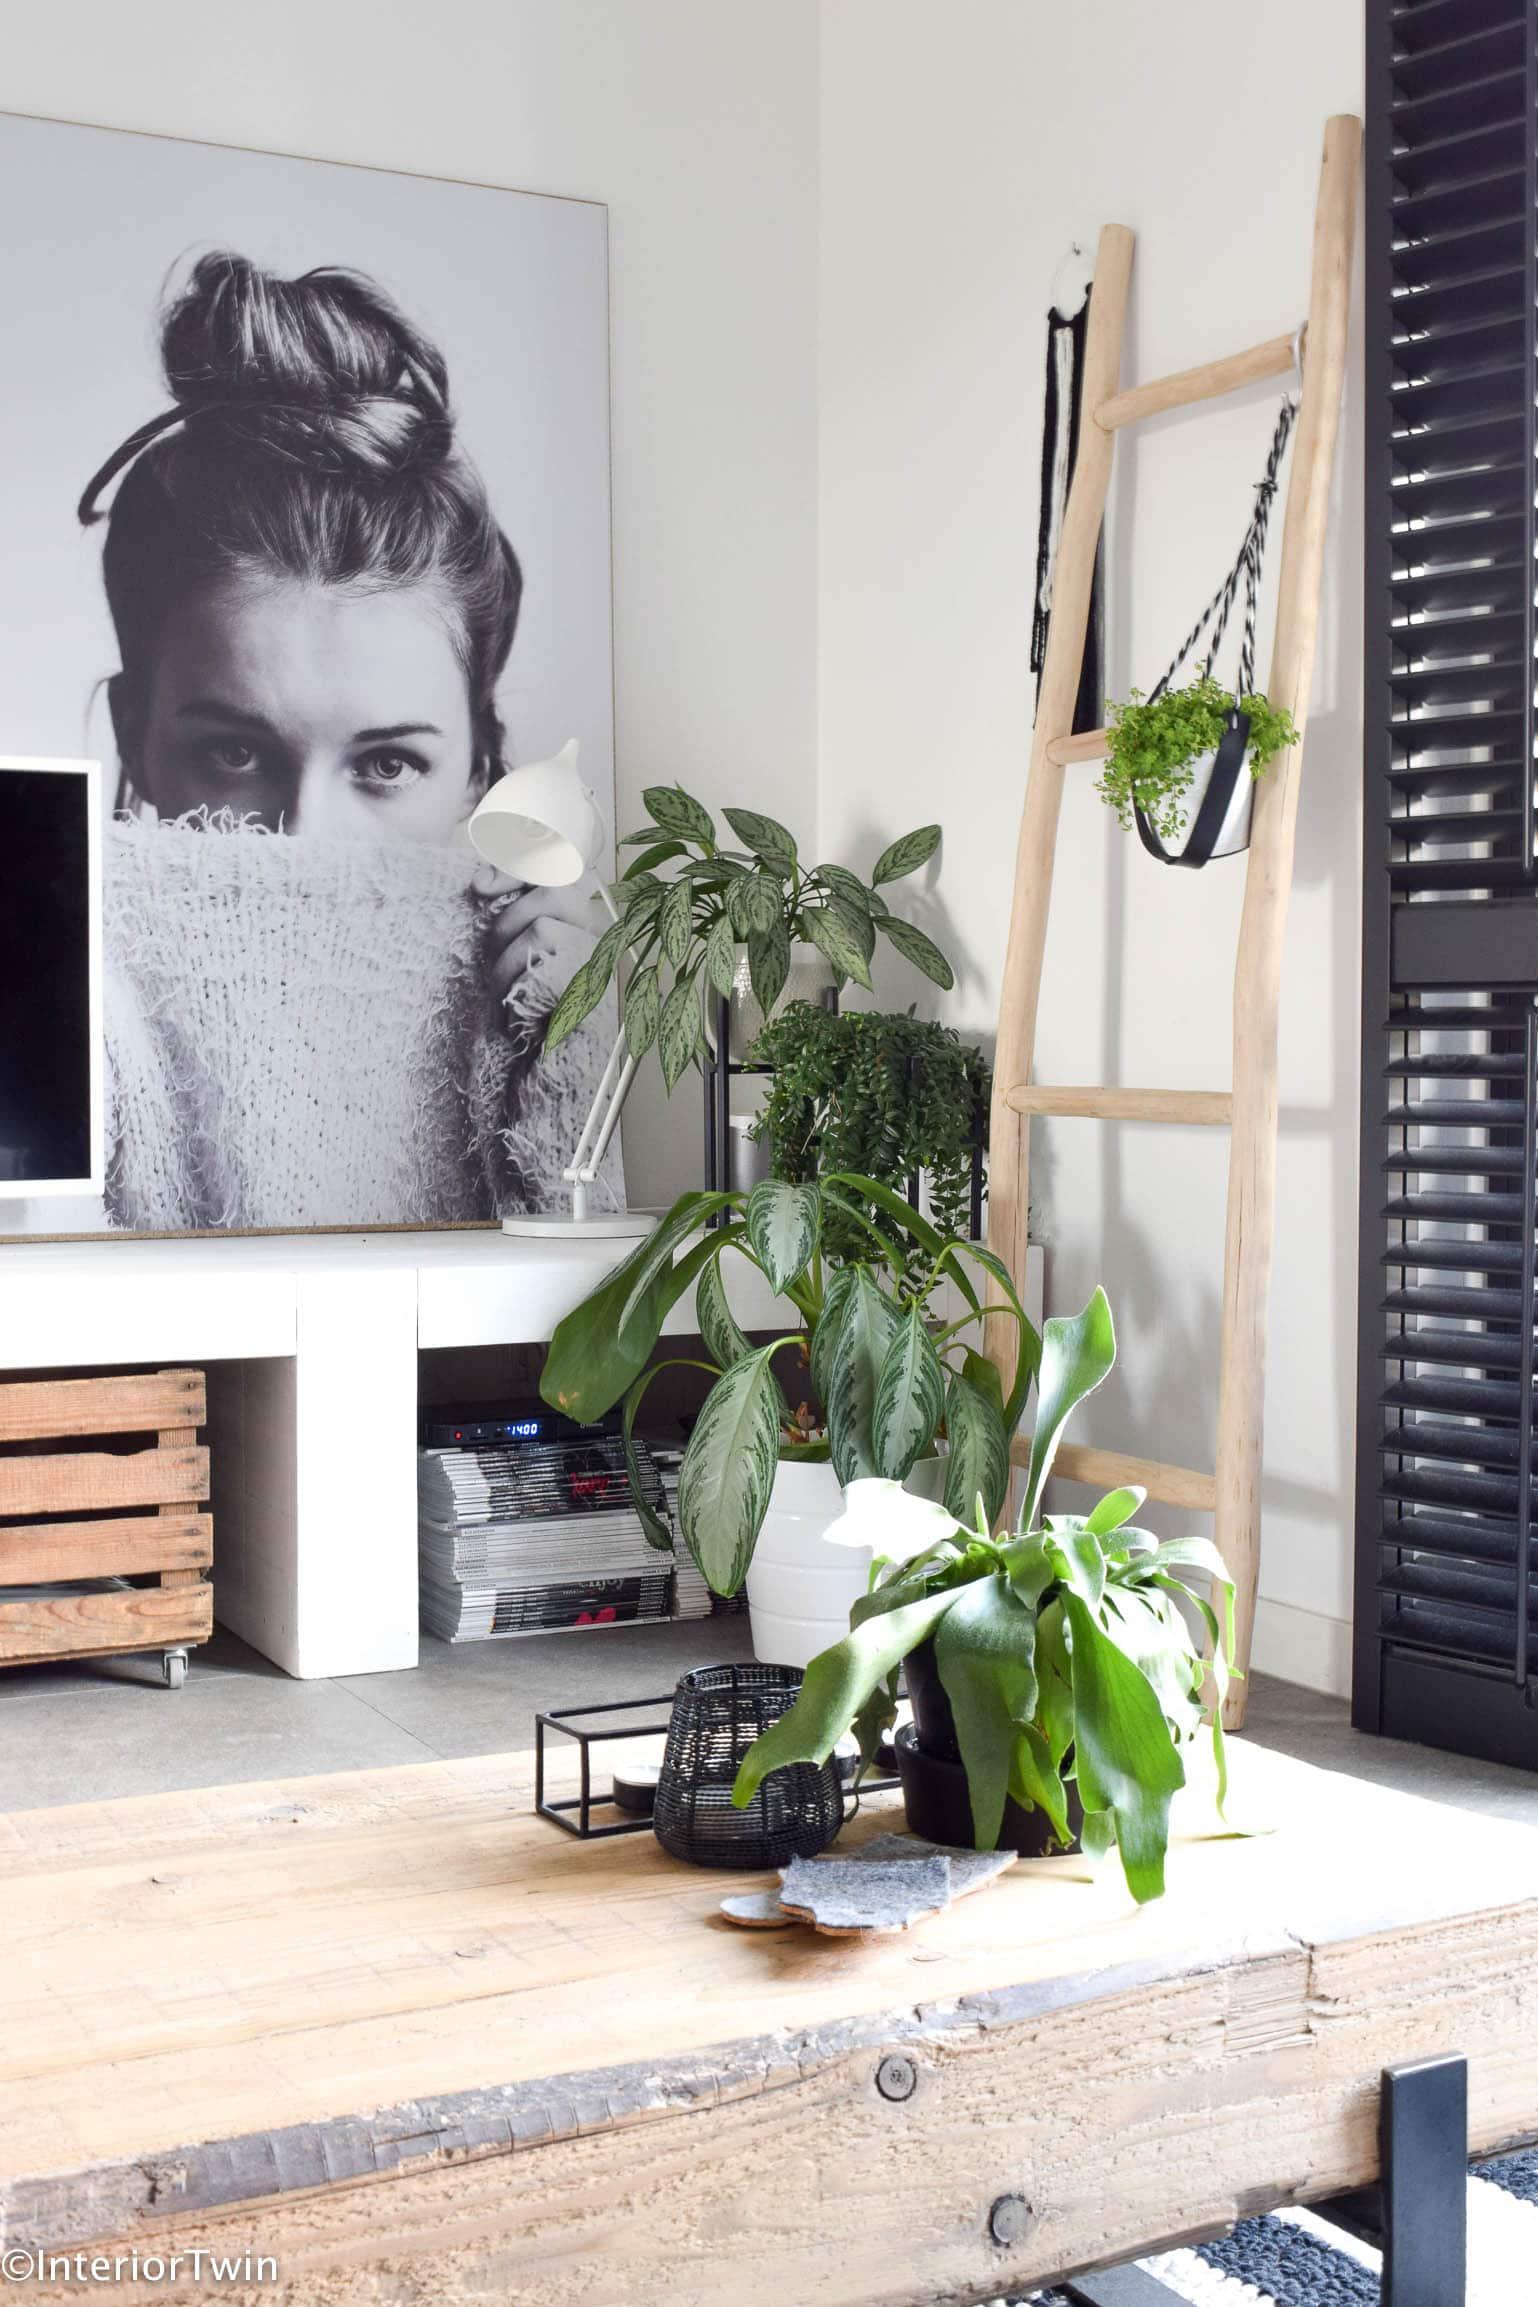 urban jungle in de woonkamer - InteriorTwin